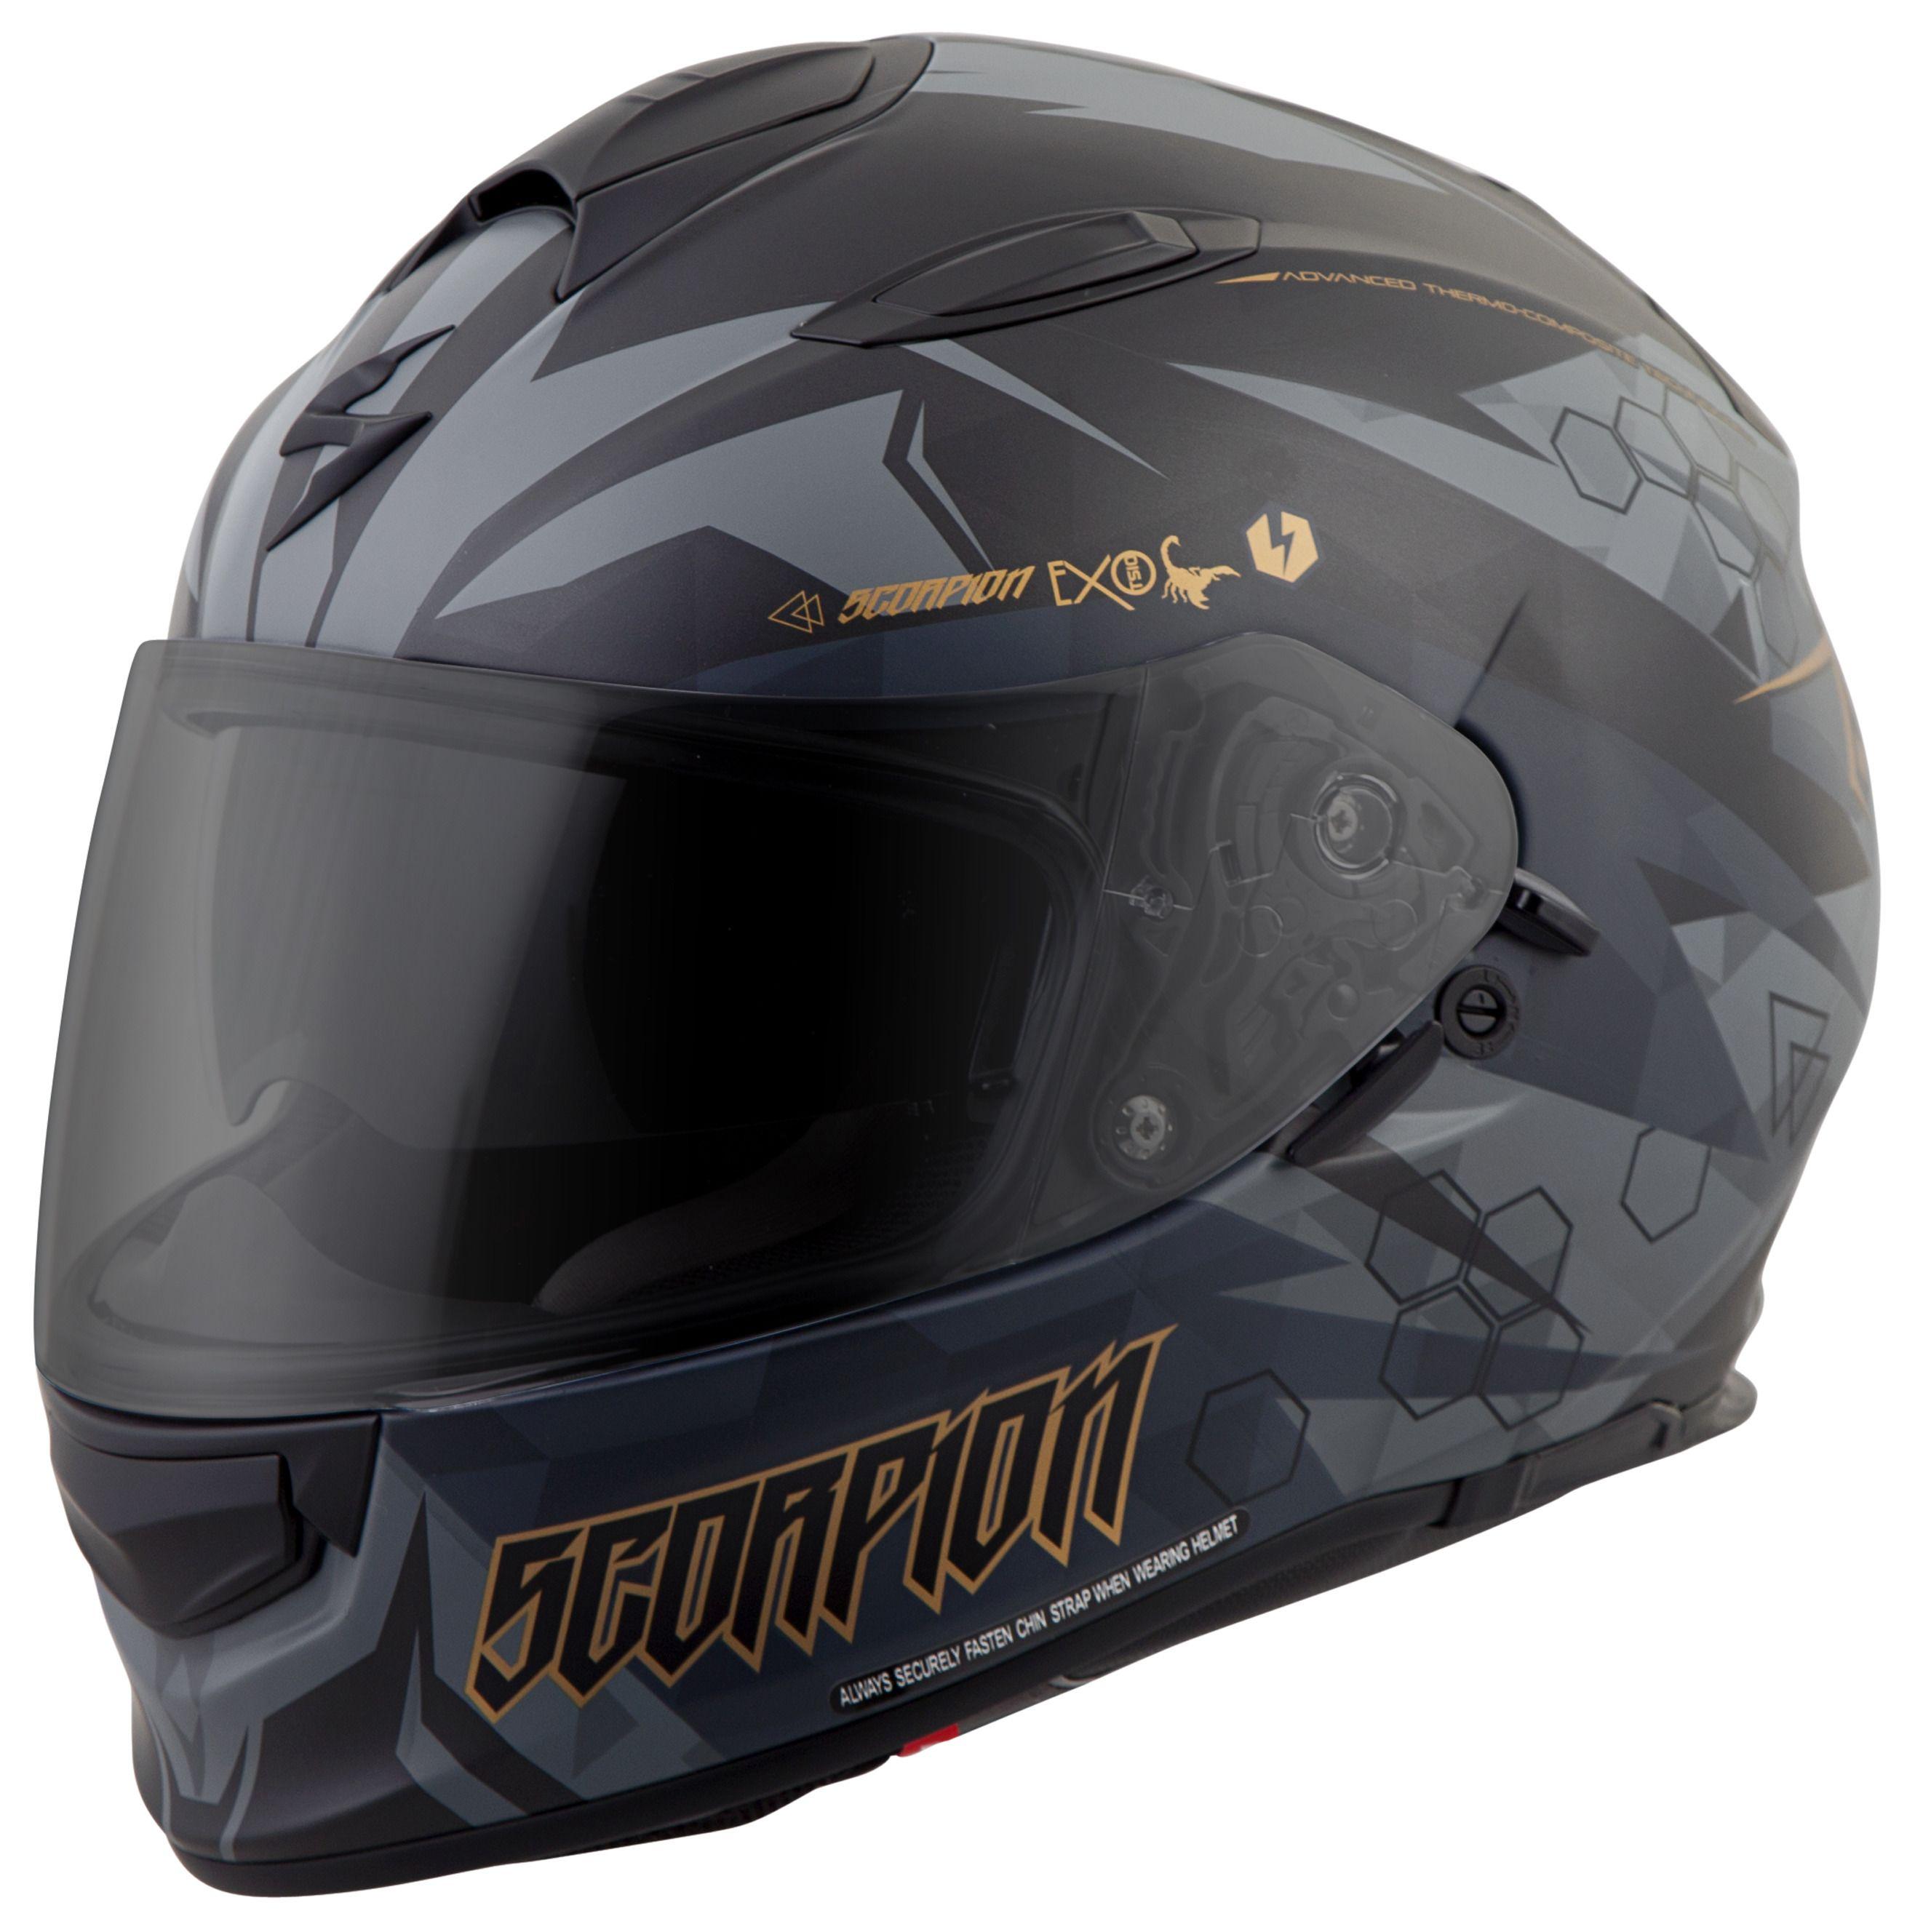 scorpion exo t510 cipher helmet revzilla. Black Bedroom Furniture Sets. Home Design Ideas